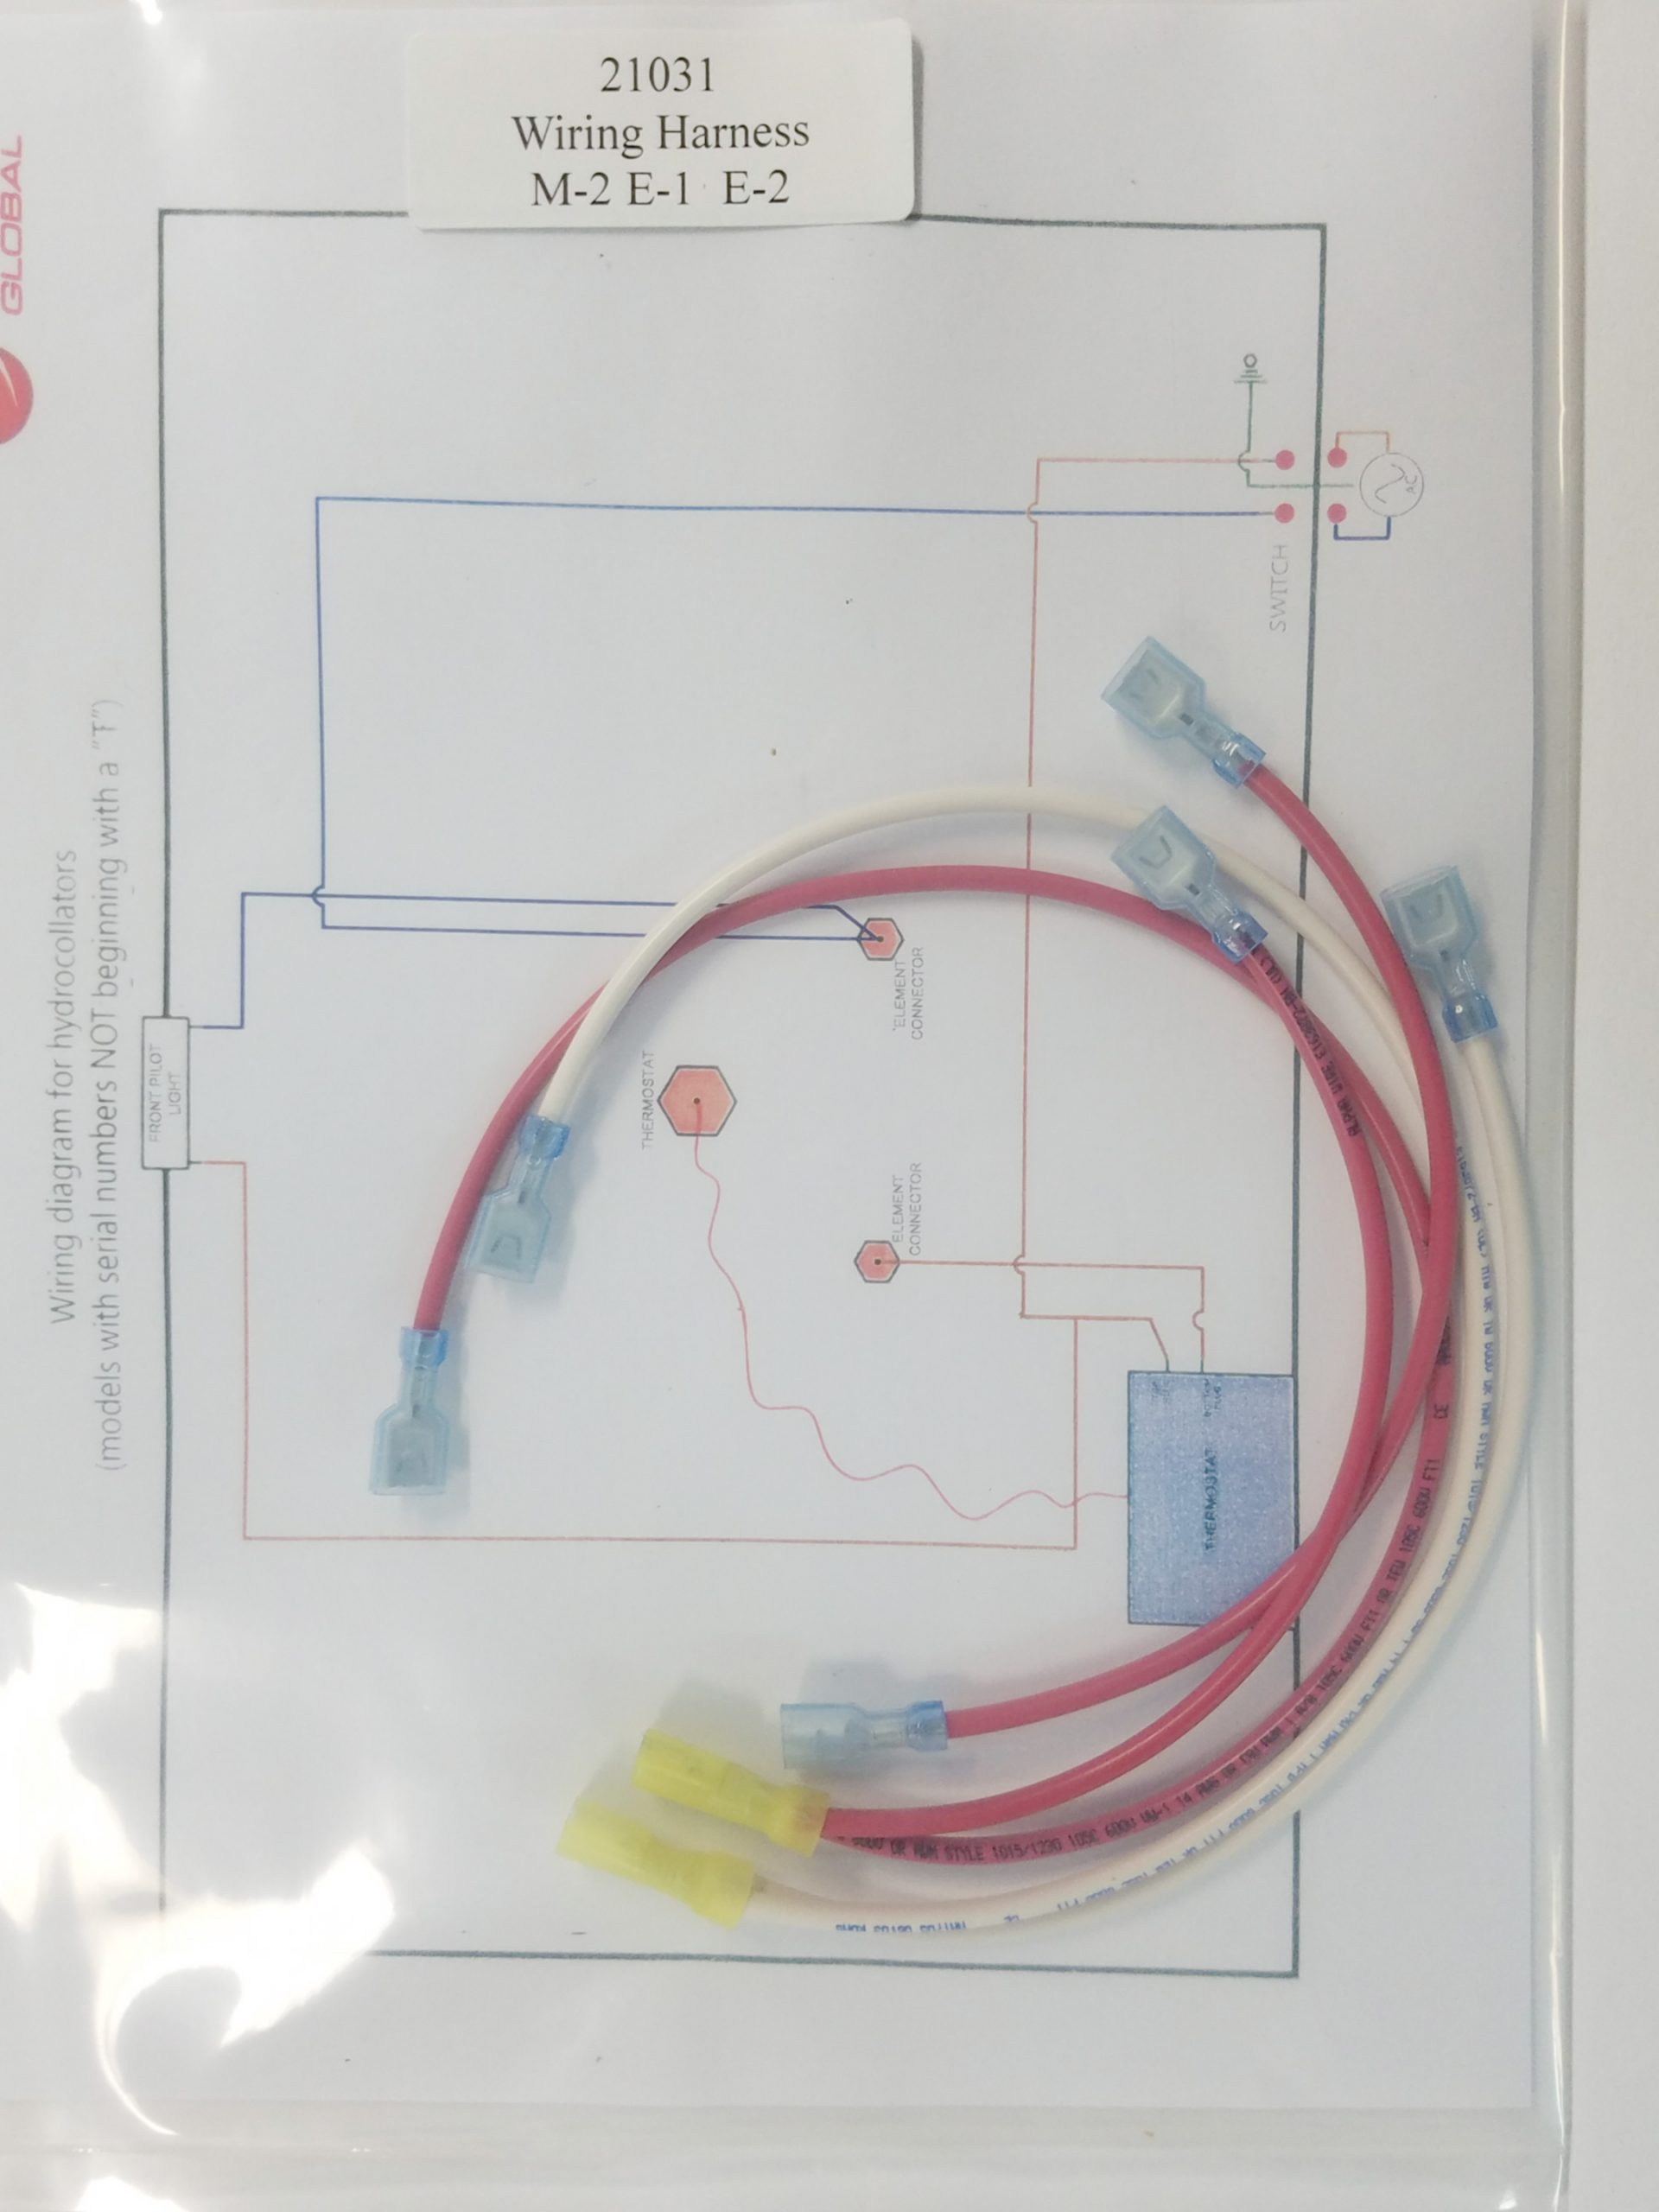 21031 Harness Wiring, E-1, E-2, SS, SS-2 & M-2 - MRChattanooga, LLC | Hydrocollator Wiring Diagram |  | MR Chattanooga, LLC